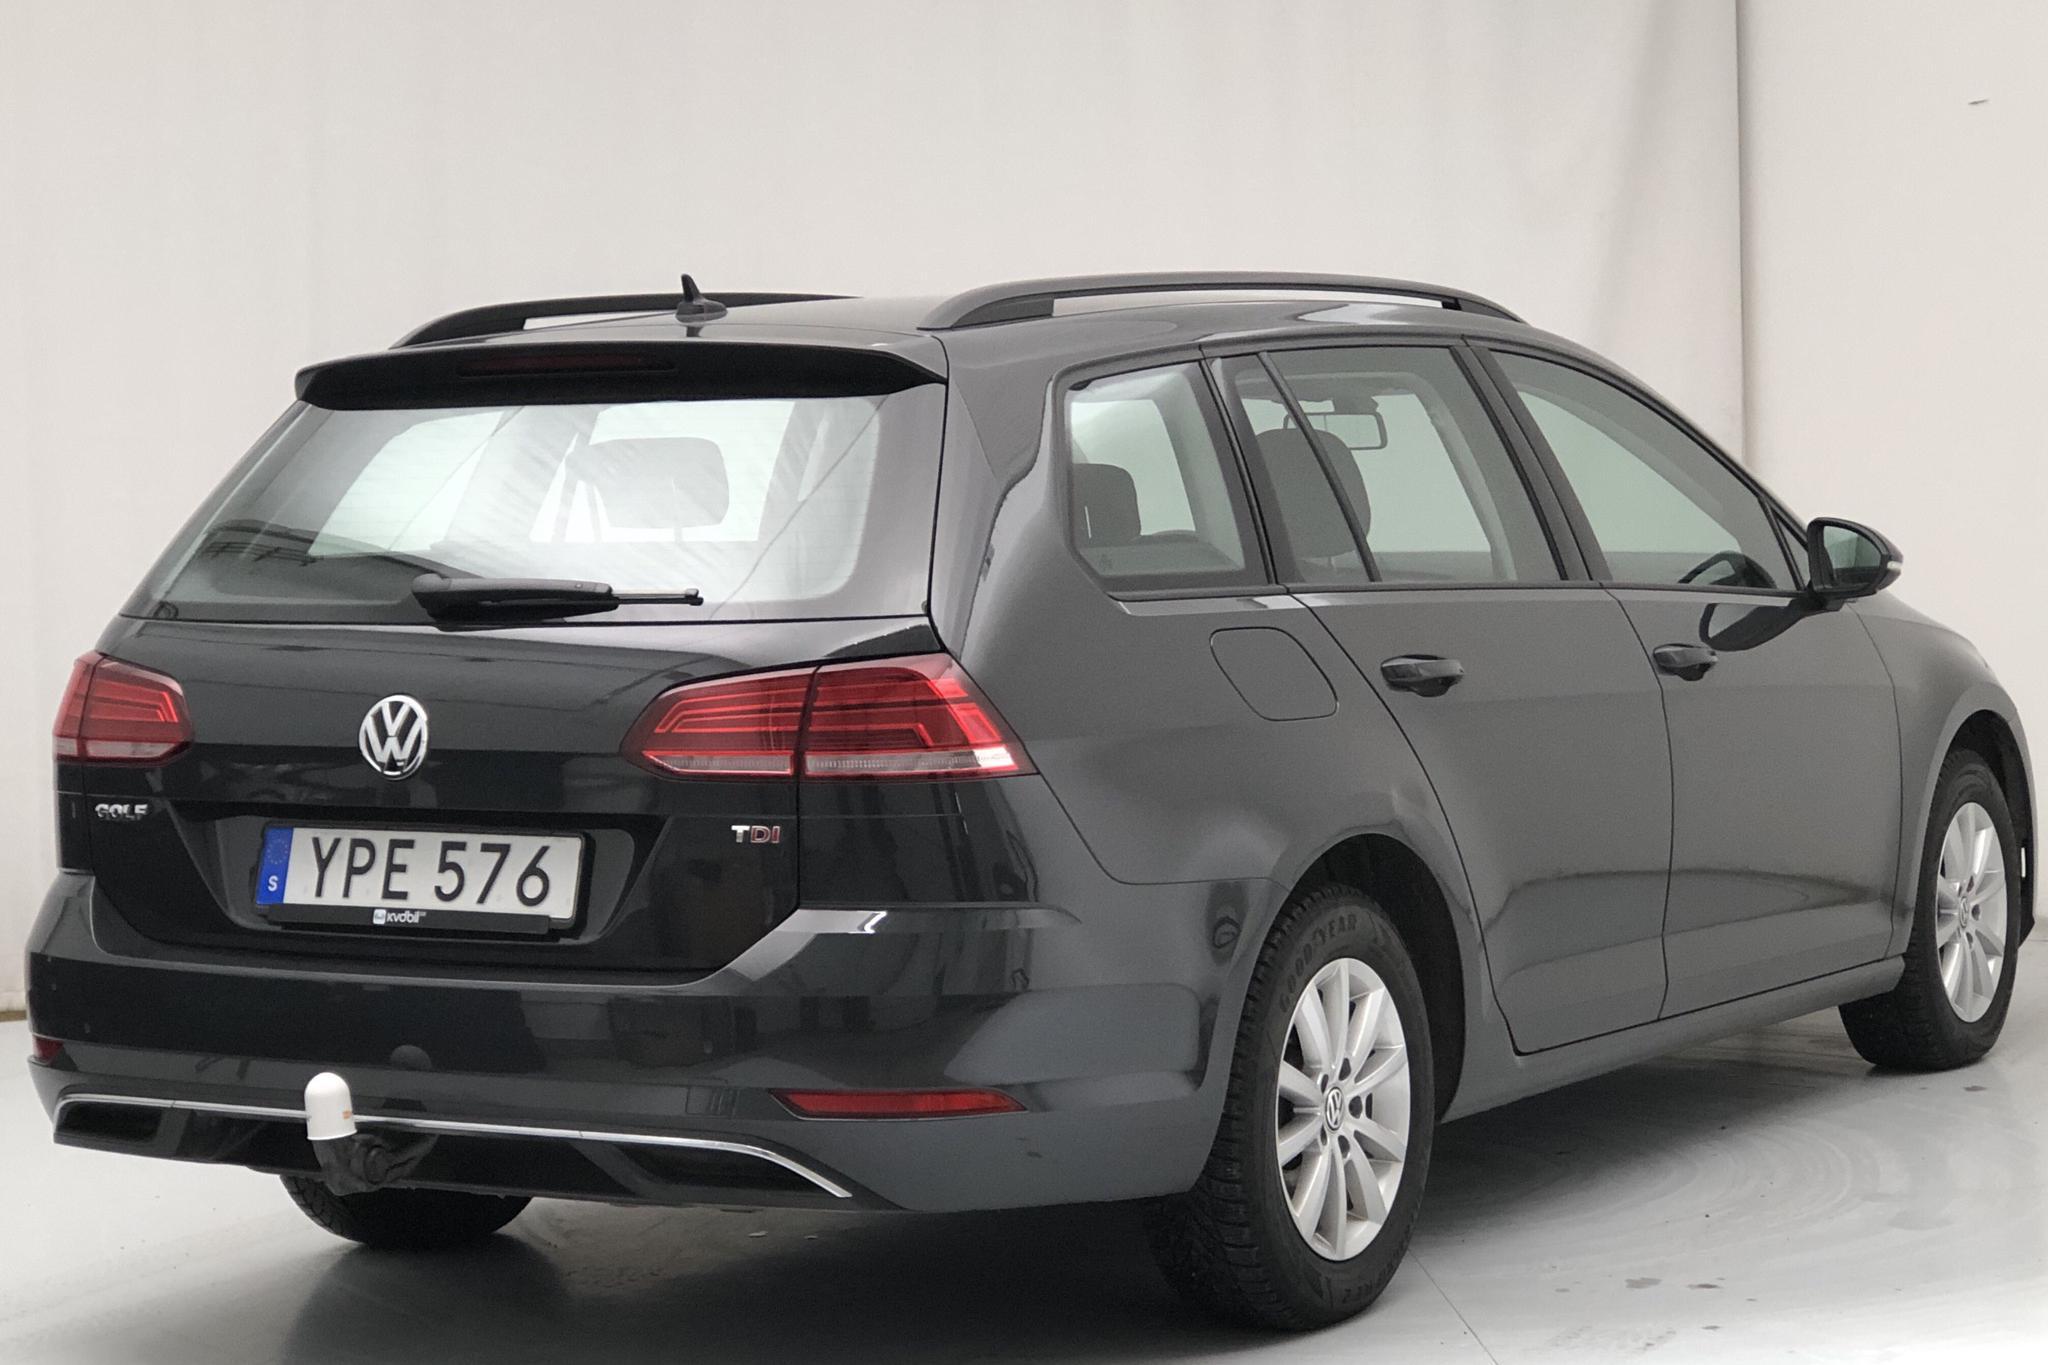 VW Golf VII 1.6 TDI Sportscombi (115hk) - 59 260 km - Automatic - Dark Grey - 2018